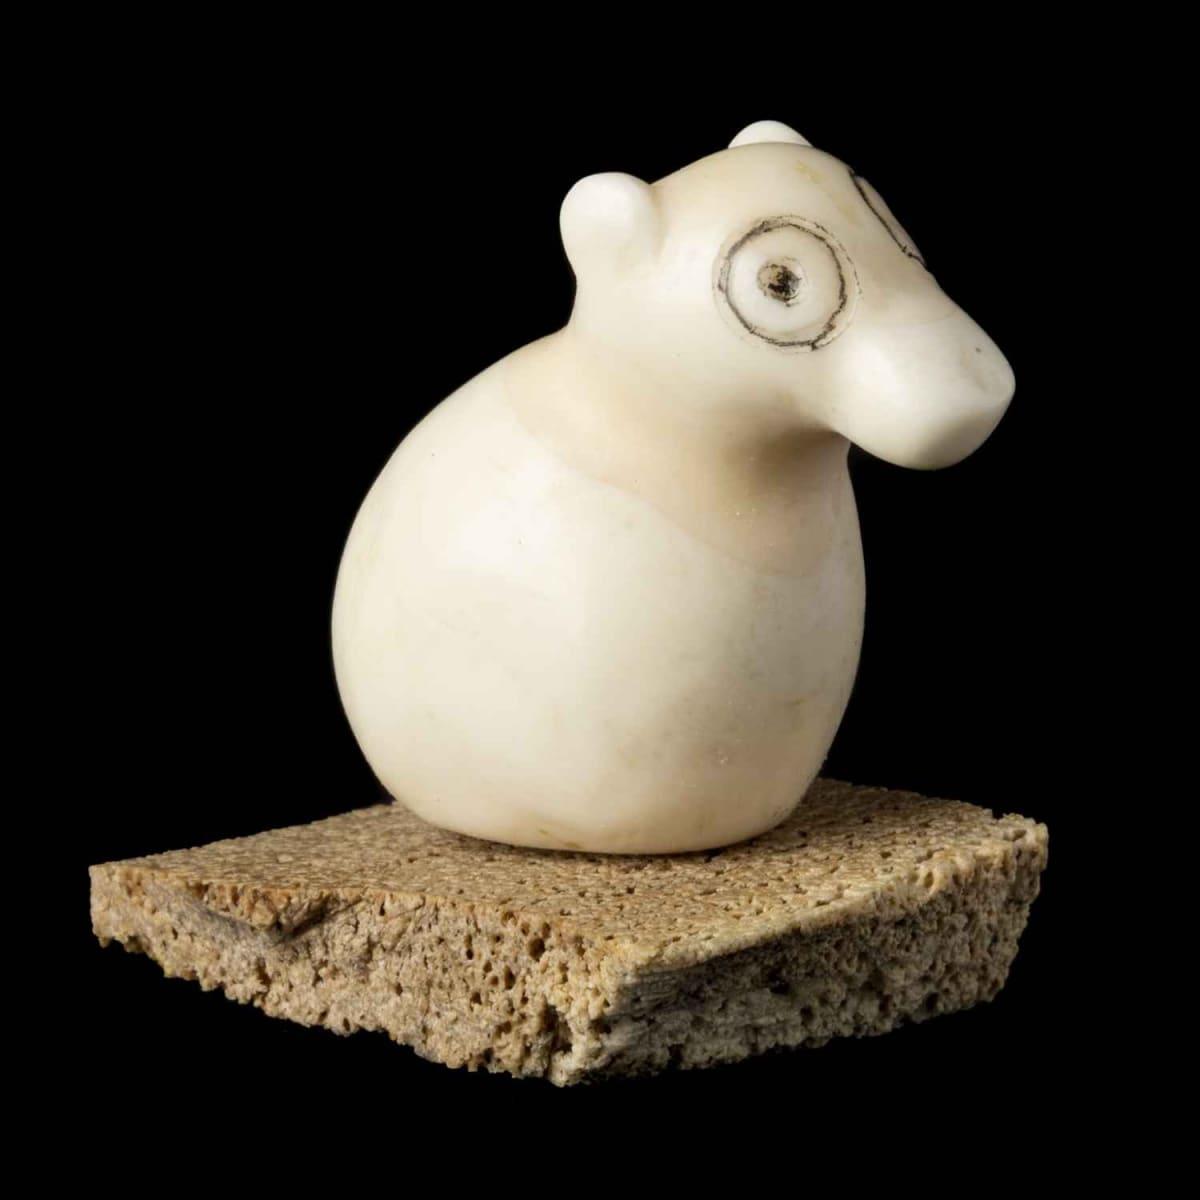 44. UNIDENTIFIED ARTIST, KUGAARUK (PELLY BAY) Rabbit, 1971